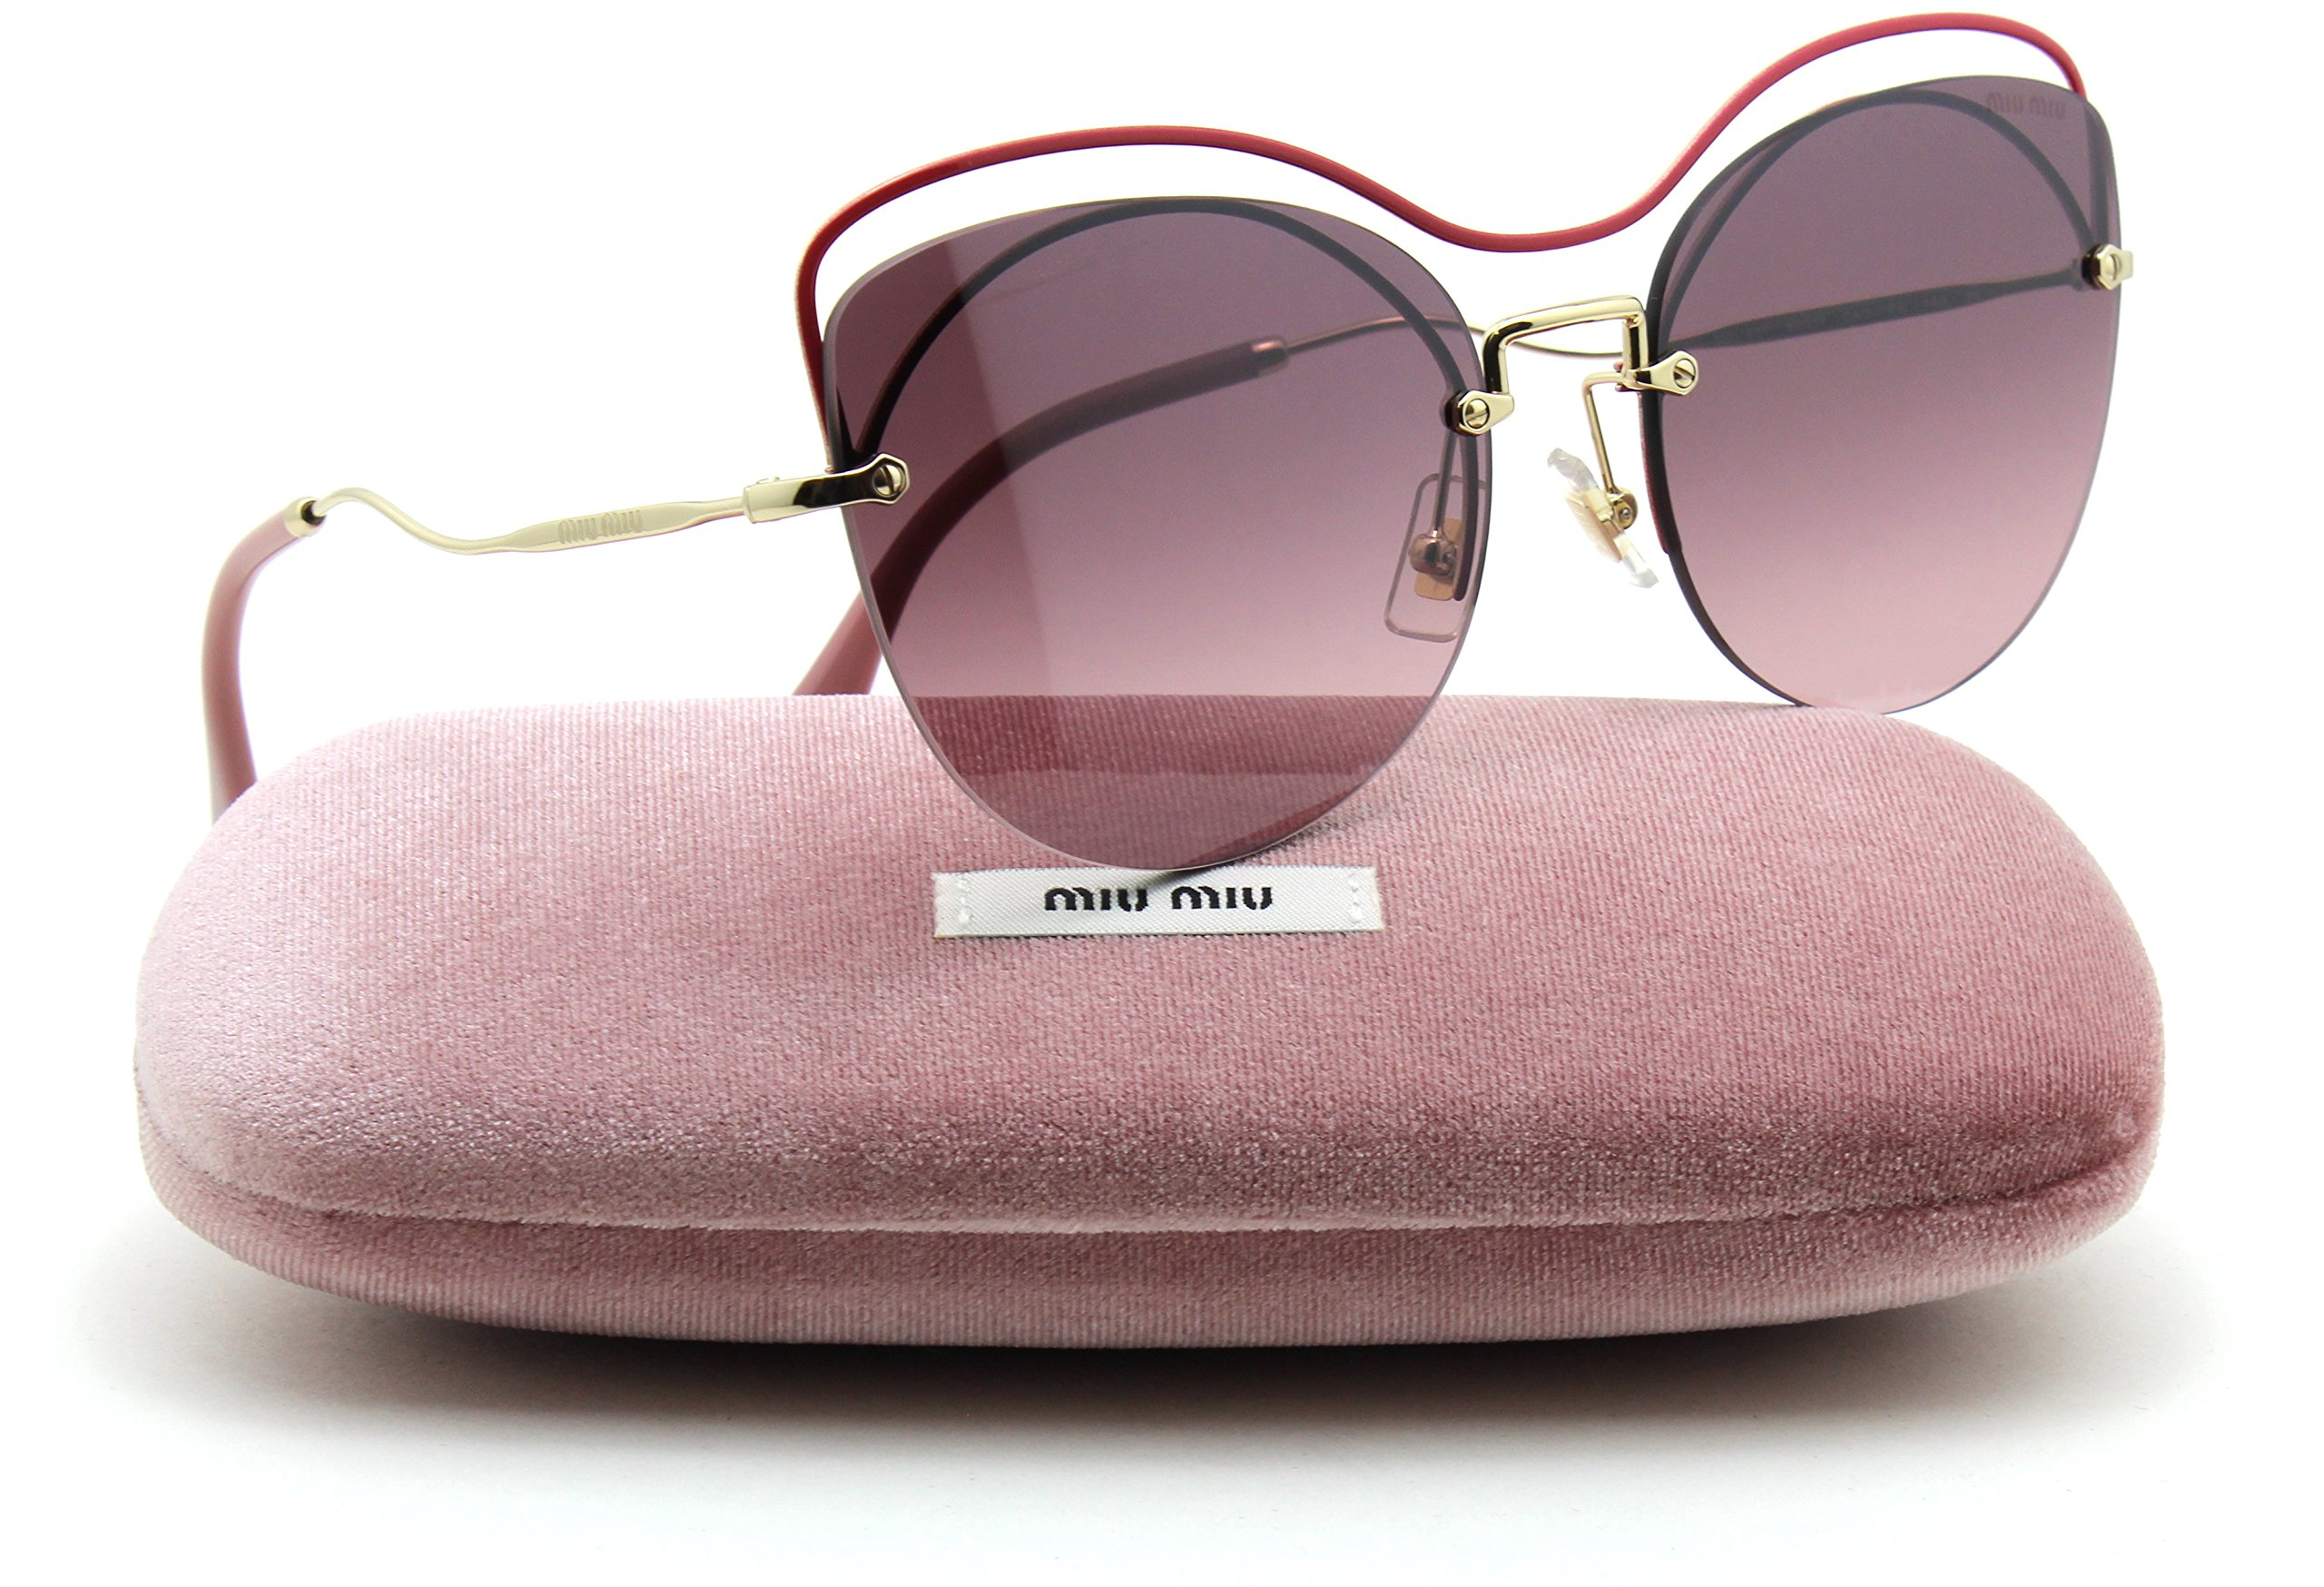 ceb0e837d Galleon - Miu Miu MU 50TS SCENIQUE Collection W/Top Bar Rimless Women  Sunglasses (Raspberry, Gradient Pink Mirror C4O-TEG)